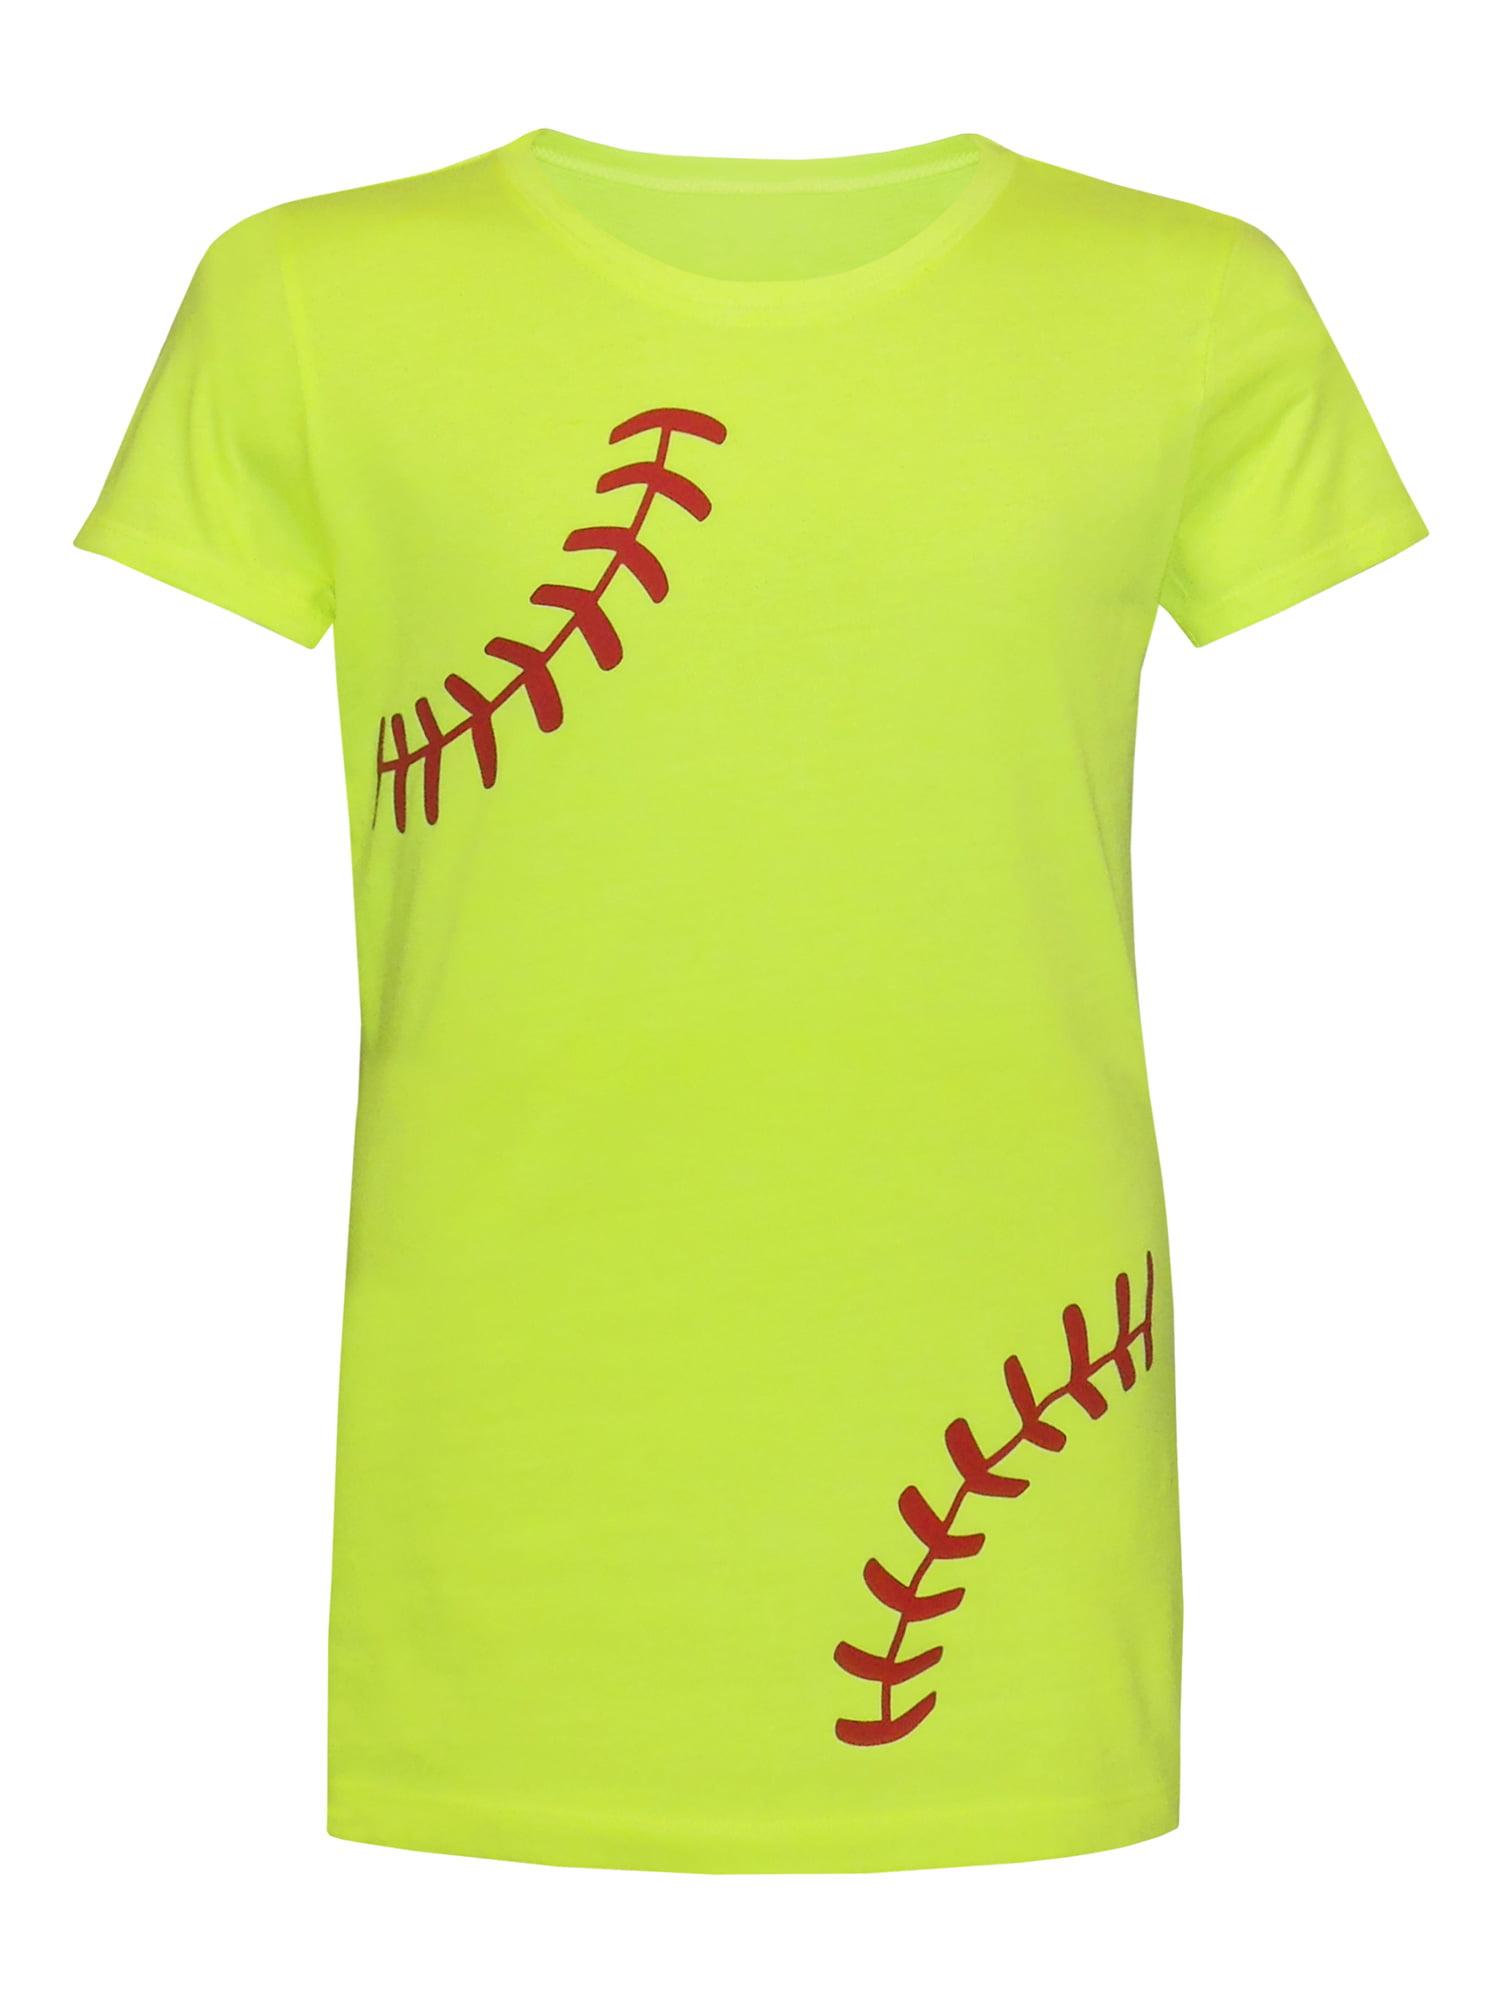 Zone Apparel Softball Girl's Youth Softball T-Shirt - Laces - Medium